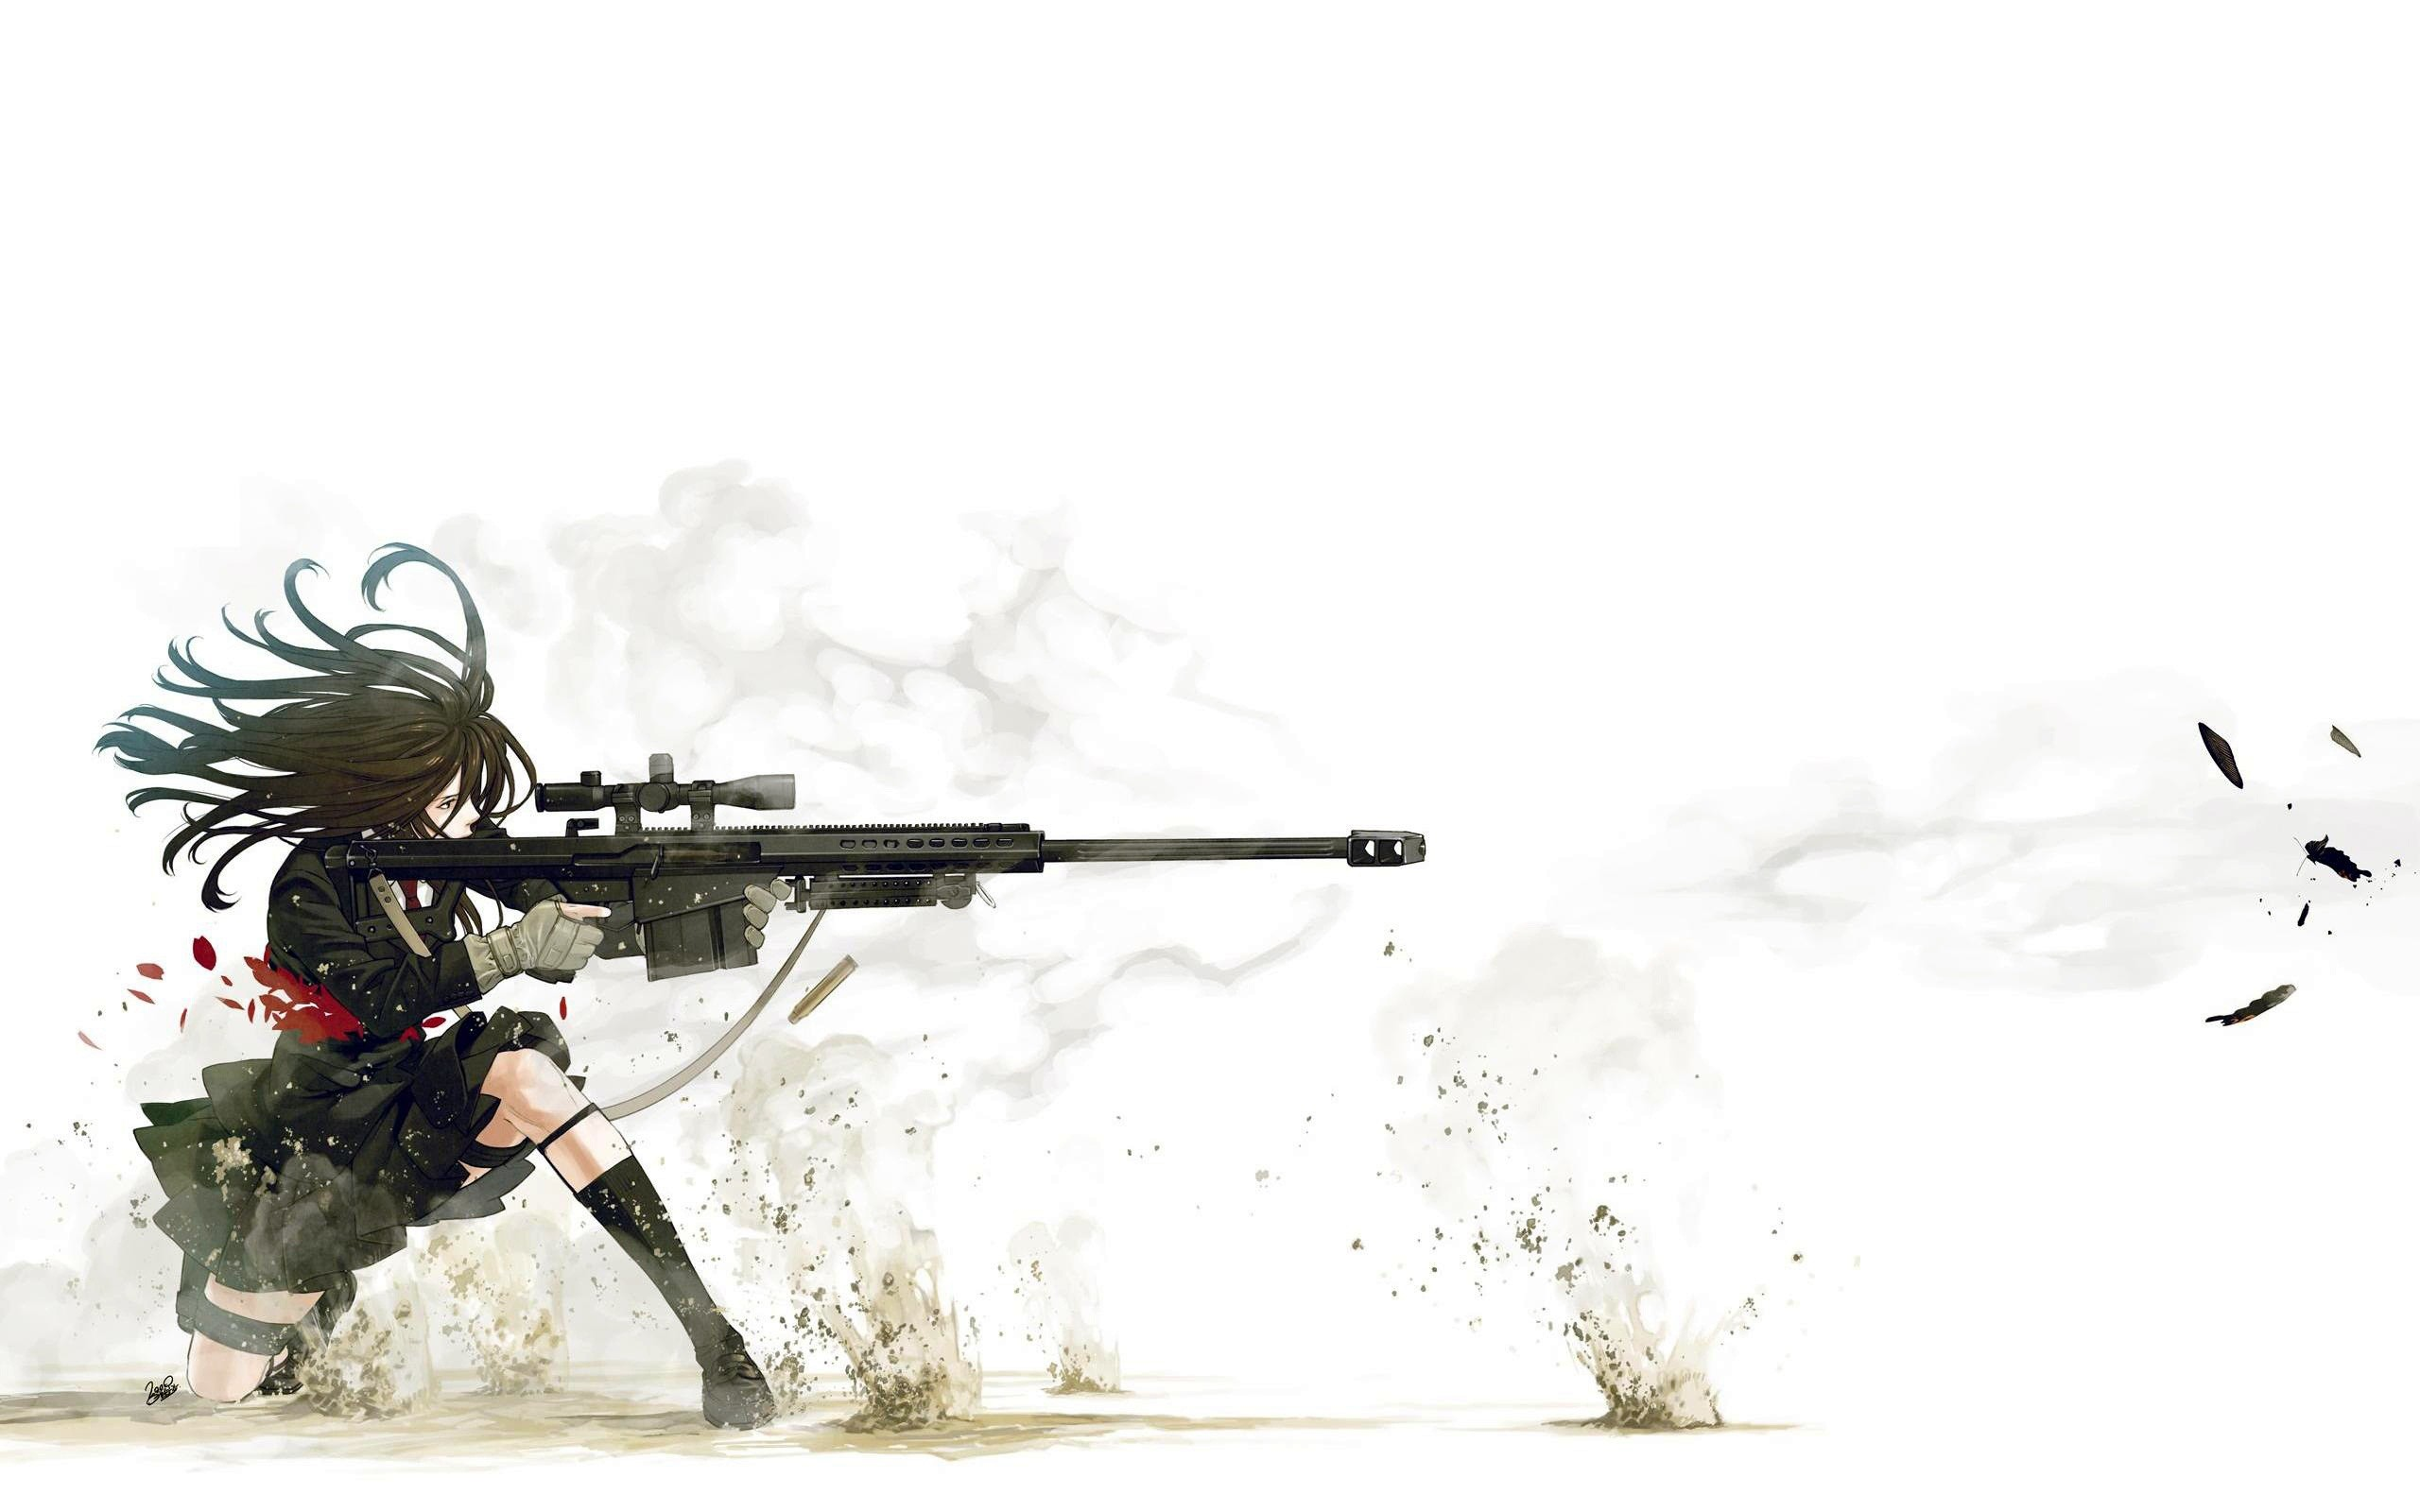 Anime Sniper Wallpaper 62 Images